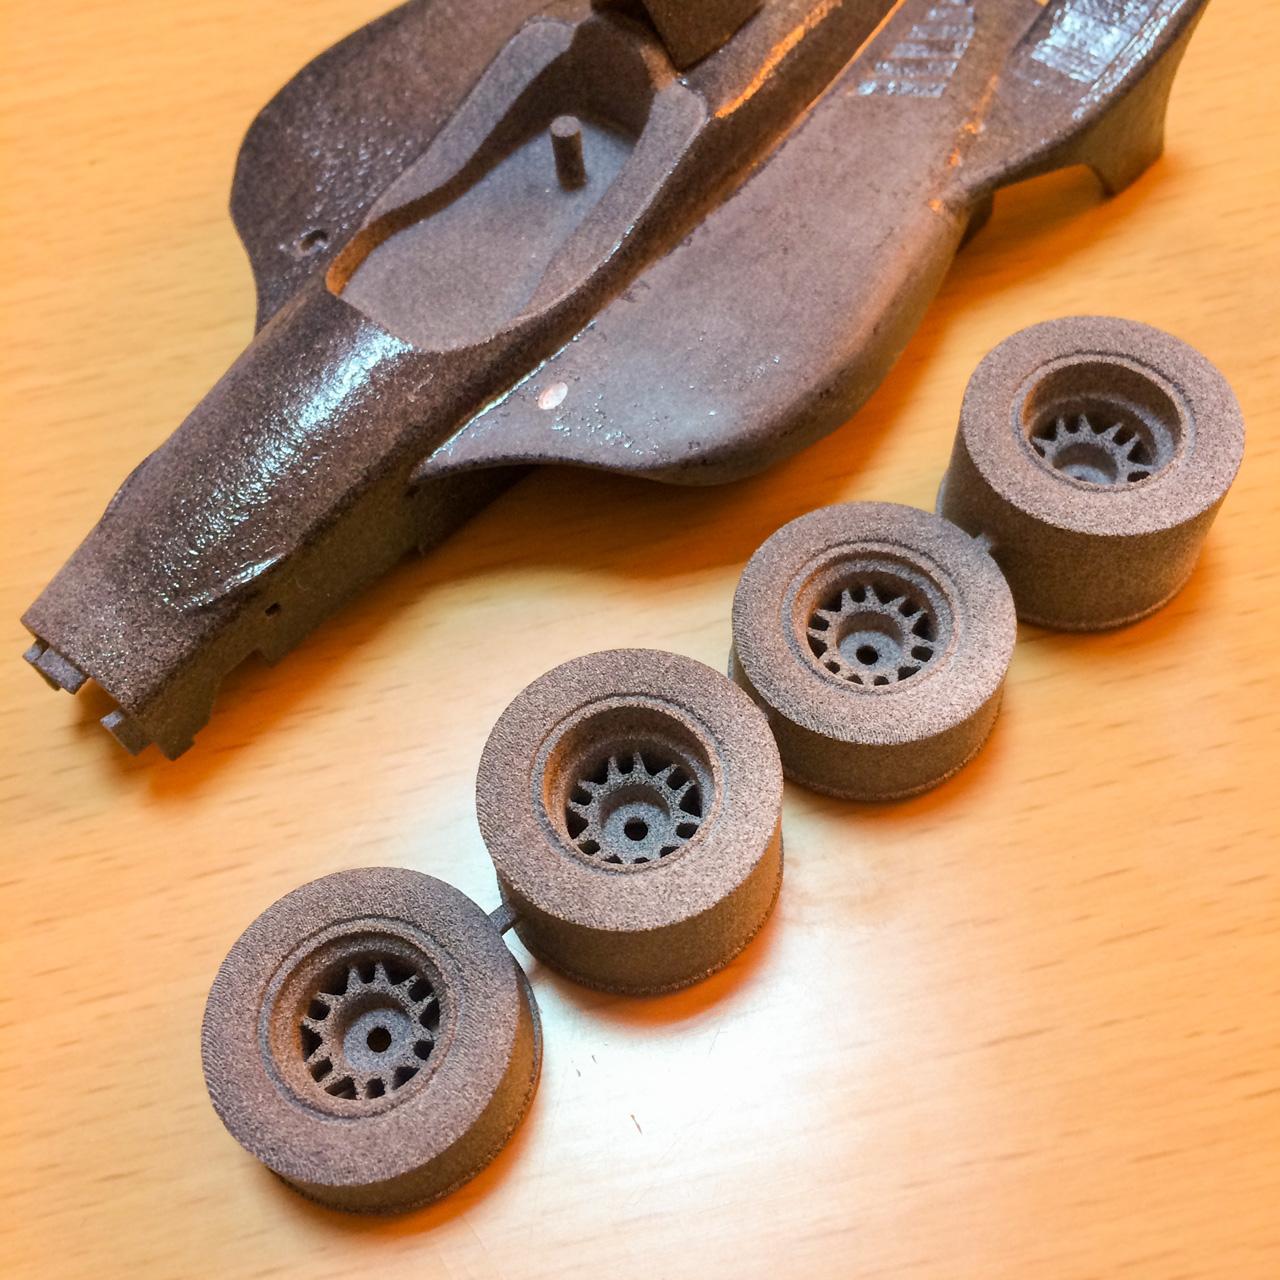 3d printed Indycar wheel for miniz f1